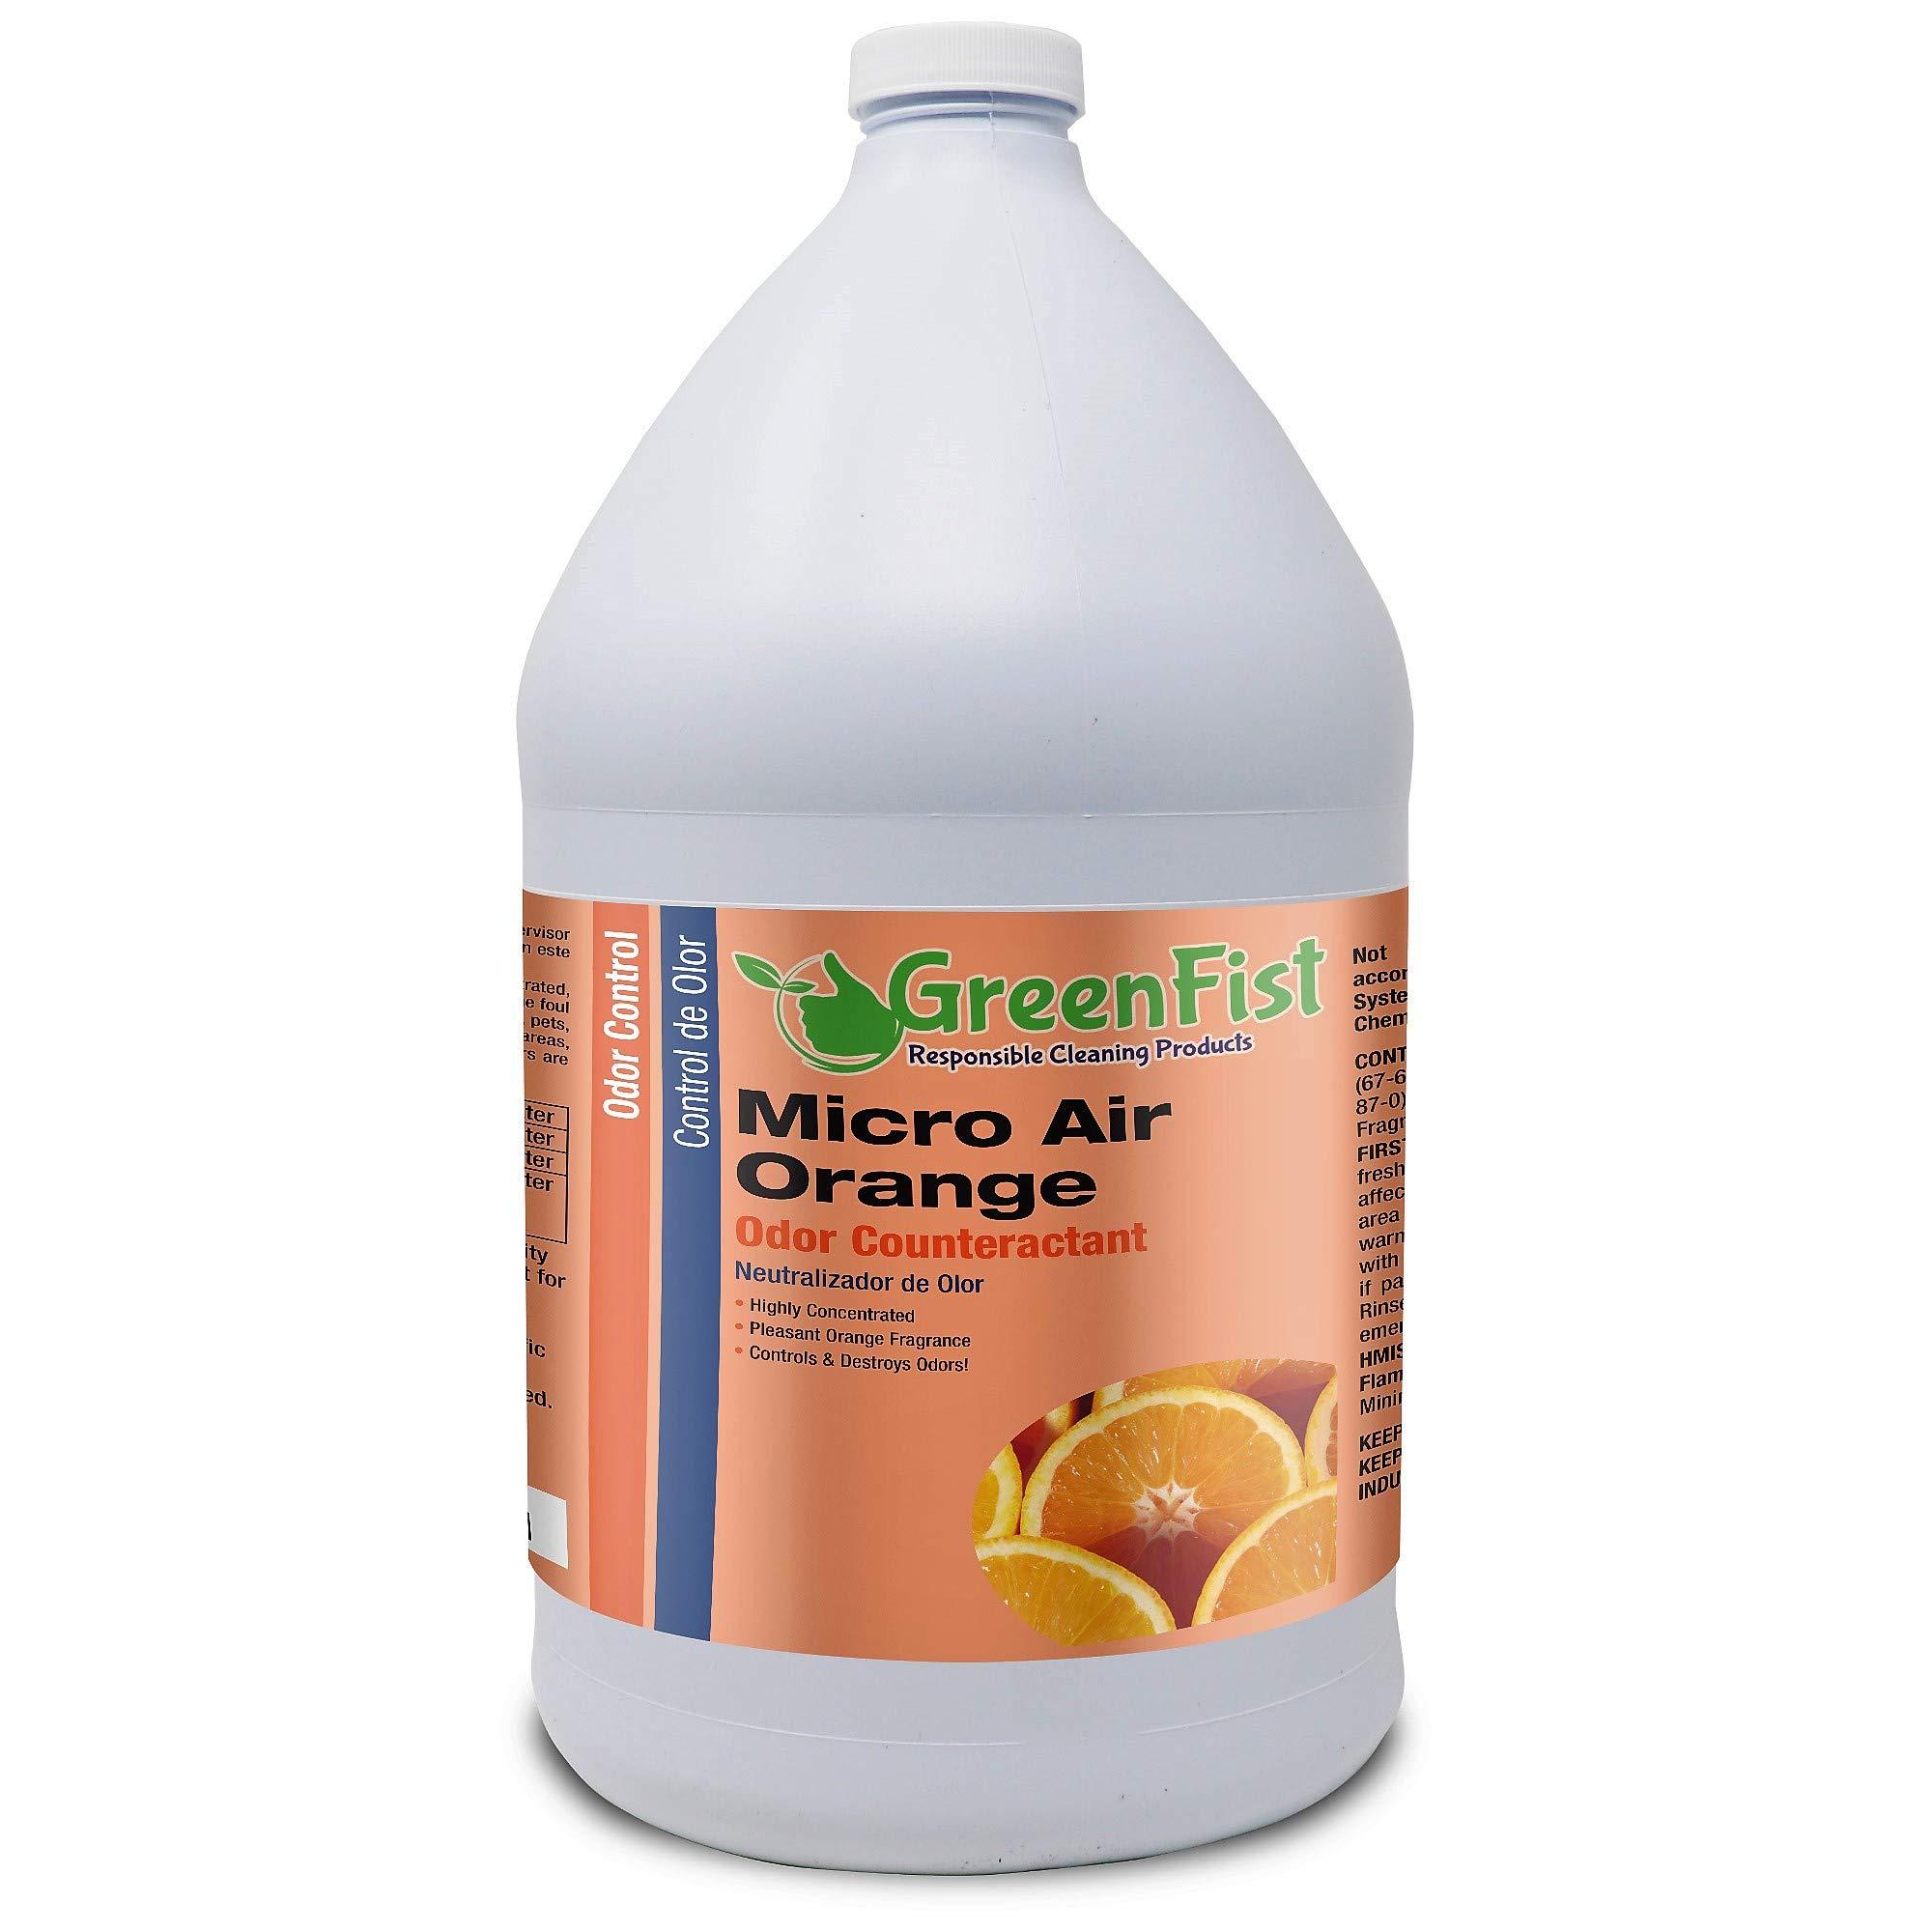 Micro Air Odor Counteractant Pleasant Orange Fragrance [ Concentrated ], 1 Gallon